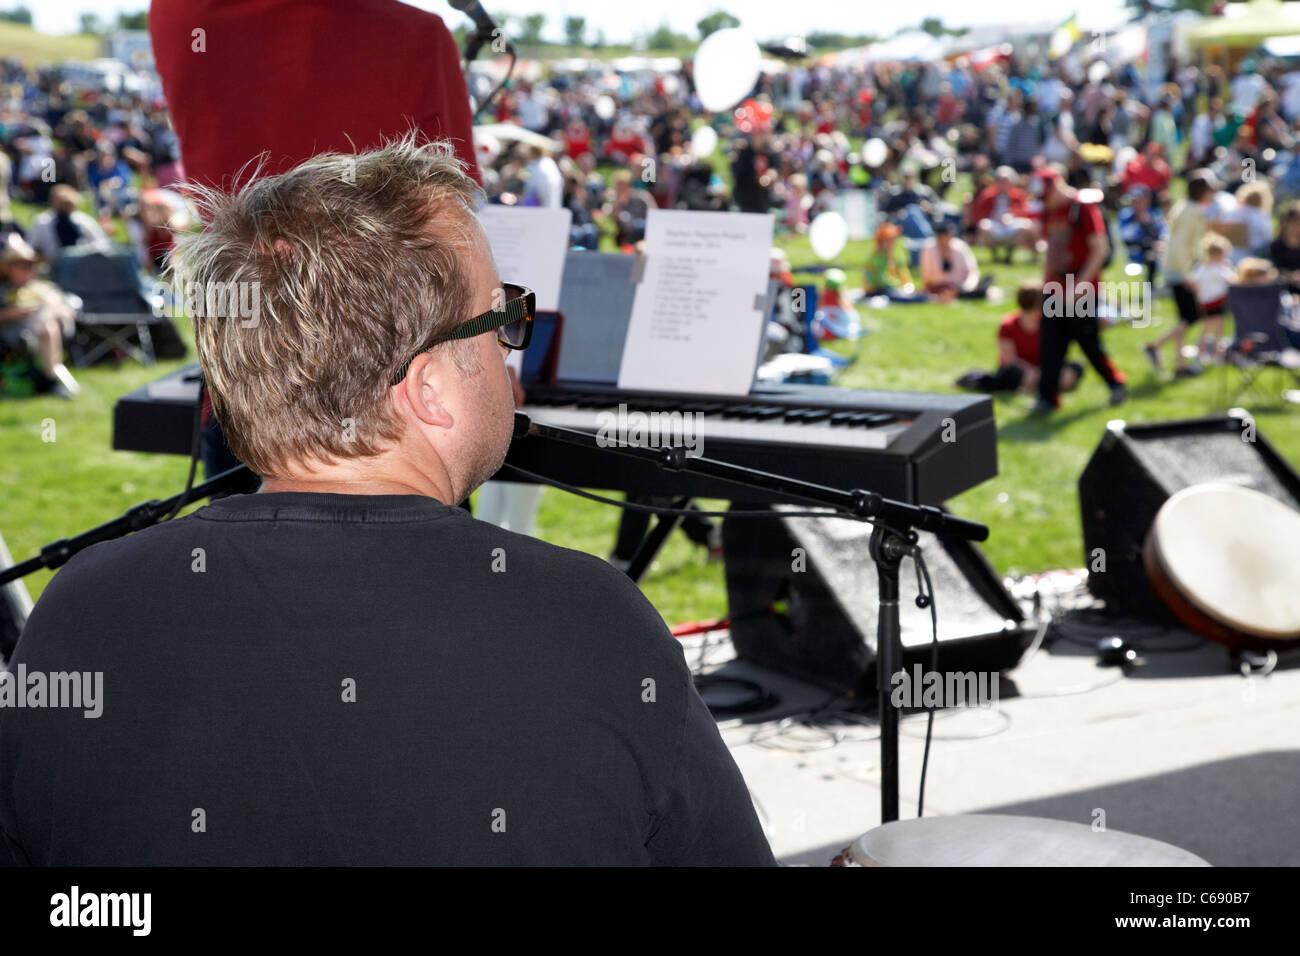 musician drummer singer on stage at a summer outdoor festival Saskatoon Saskatchewan Canada - Stock Image